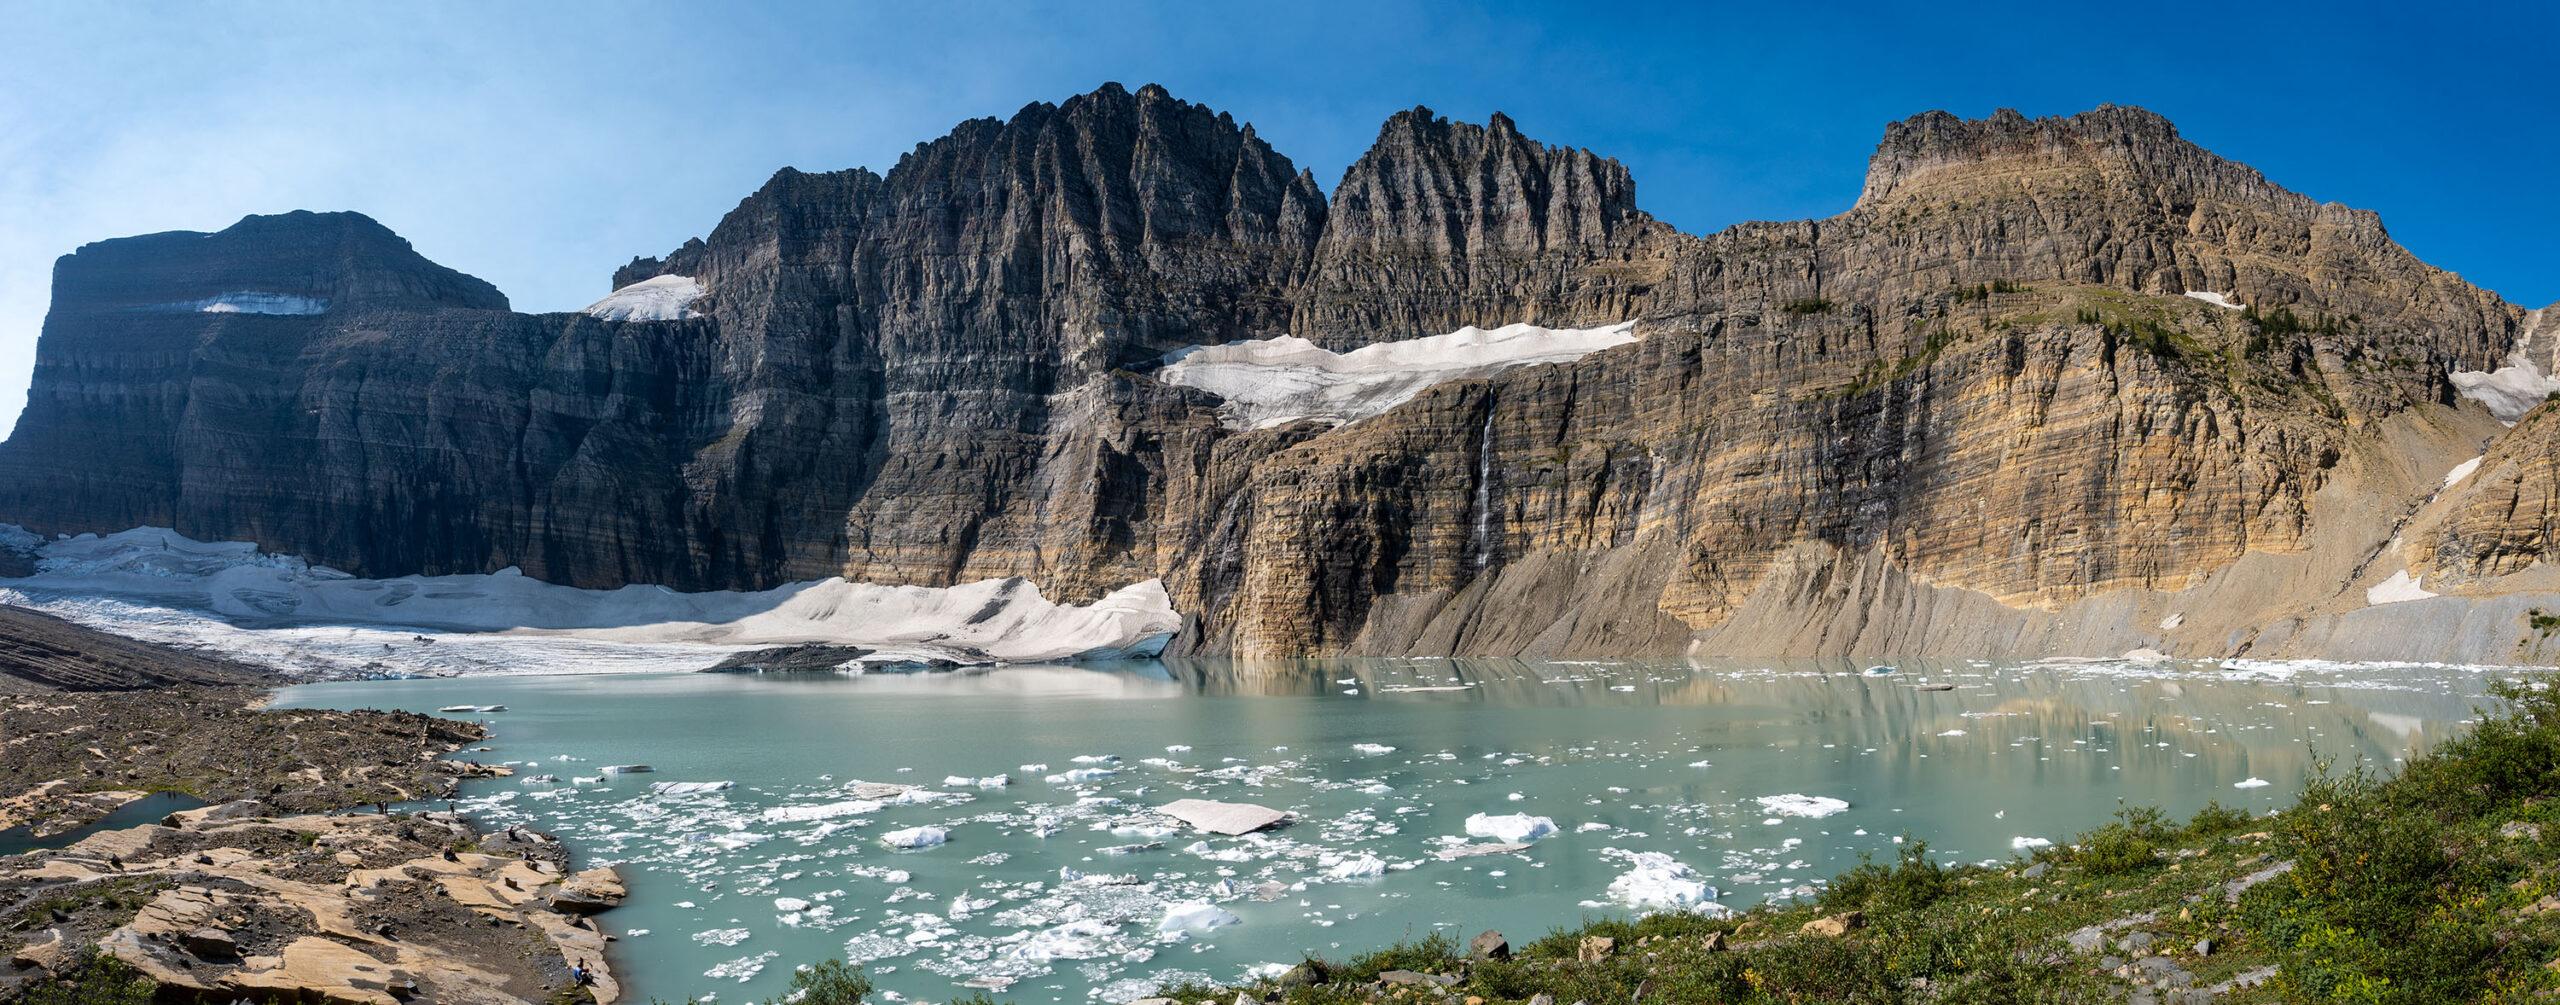 Grinnell Glacier & Upper Grinnell Lake